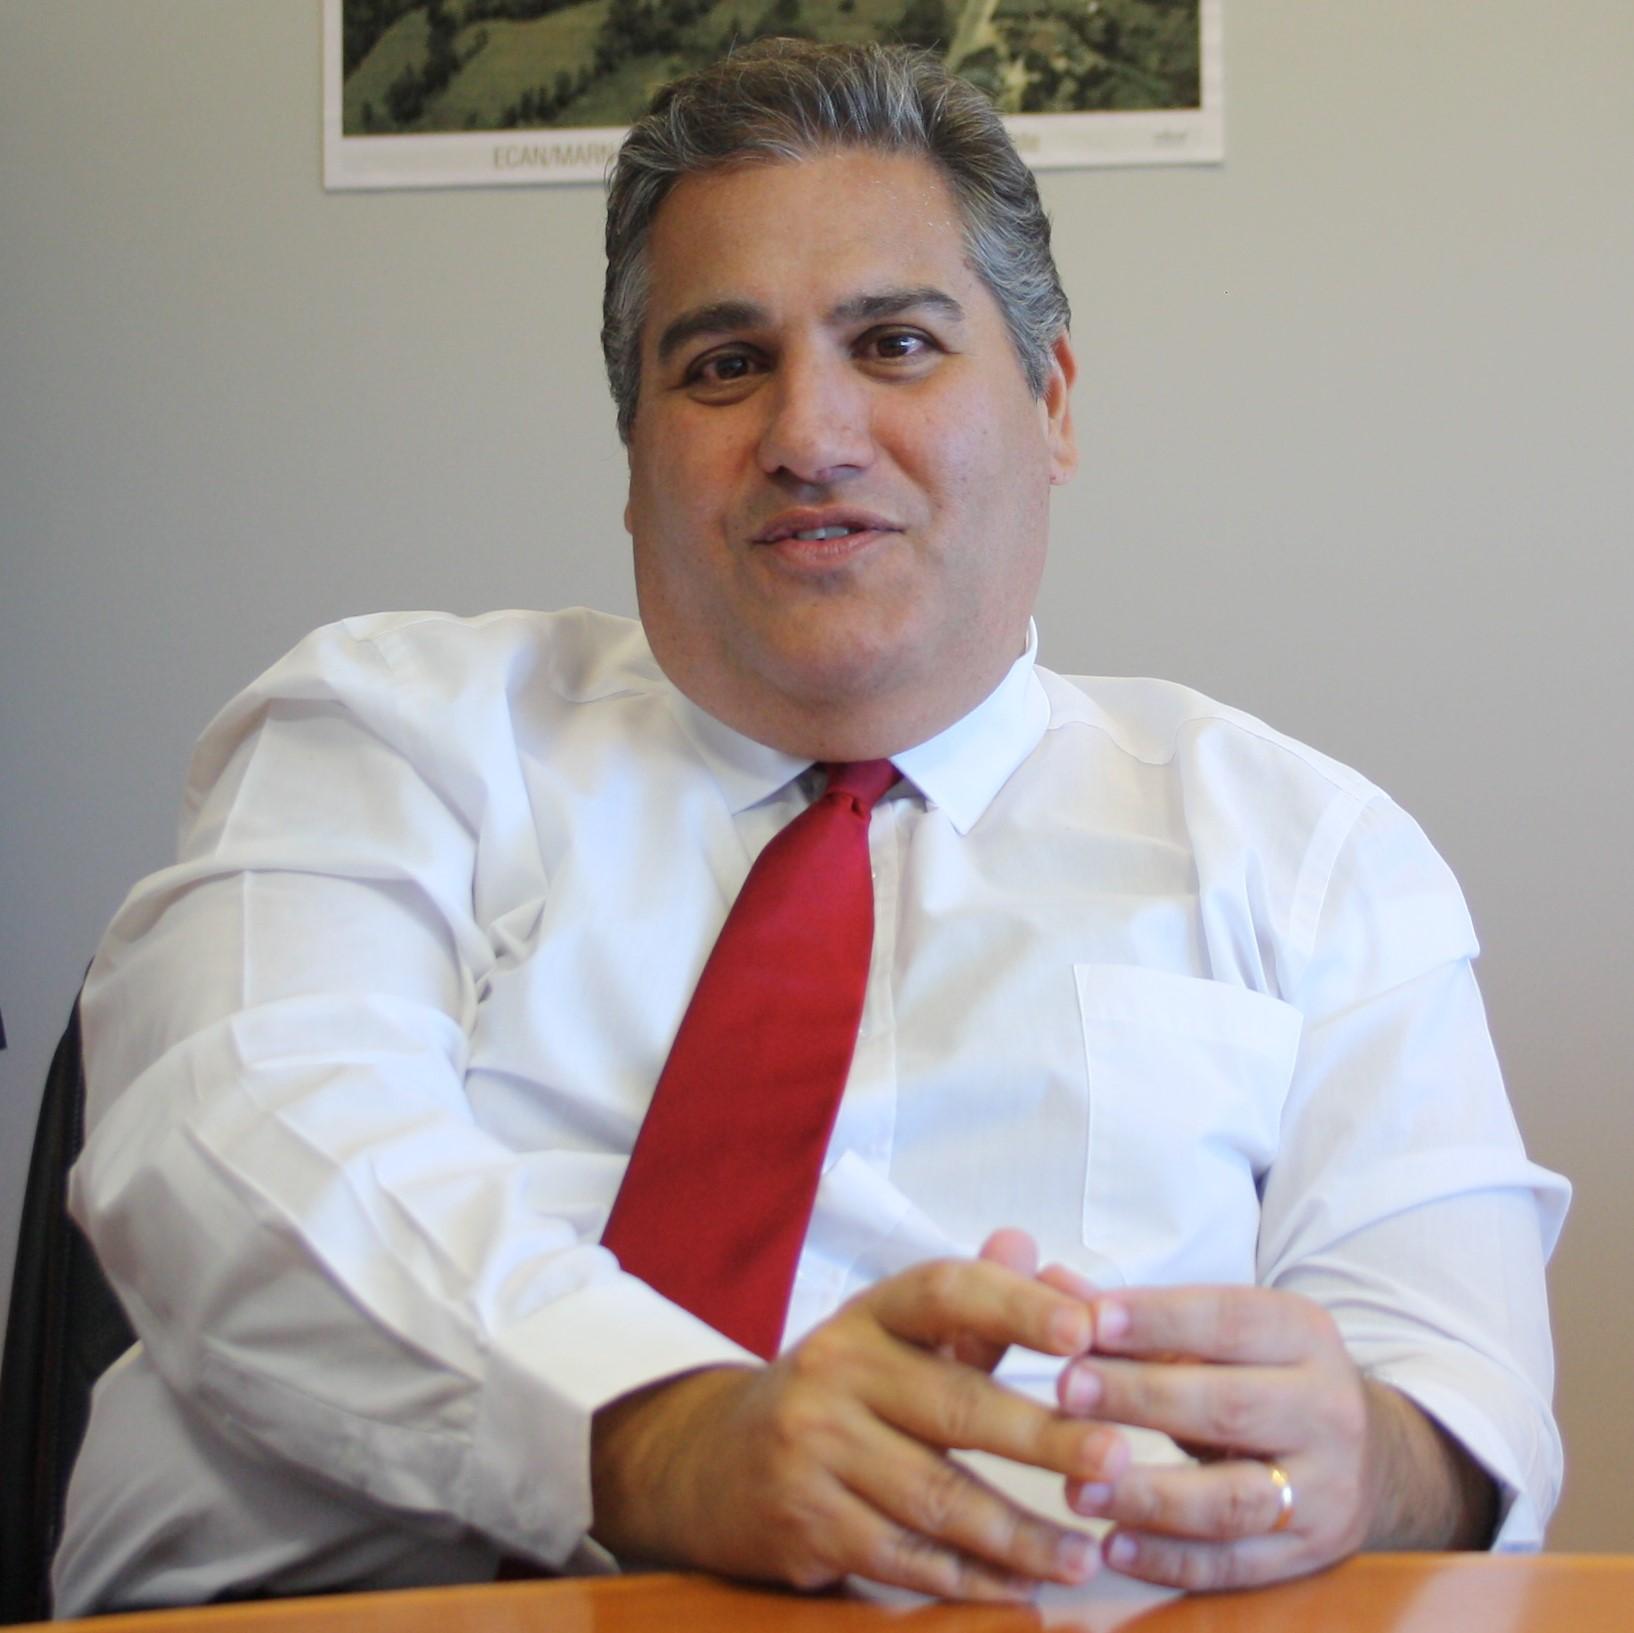 Rui Paulo Figueiredo